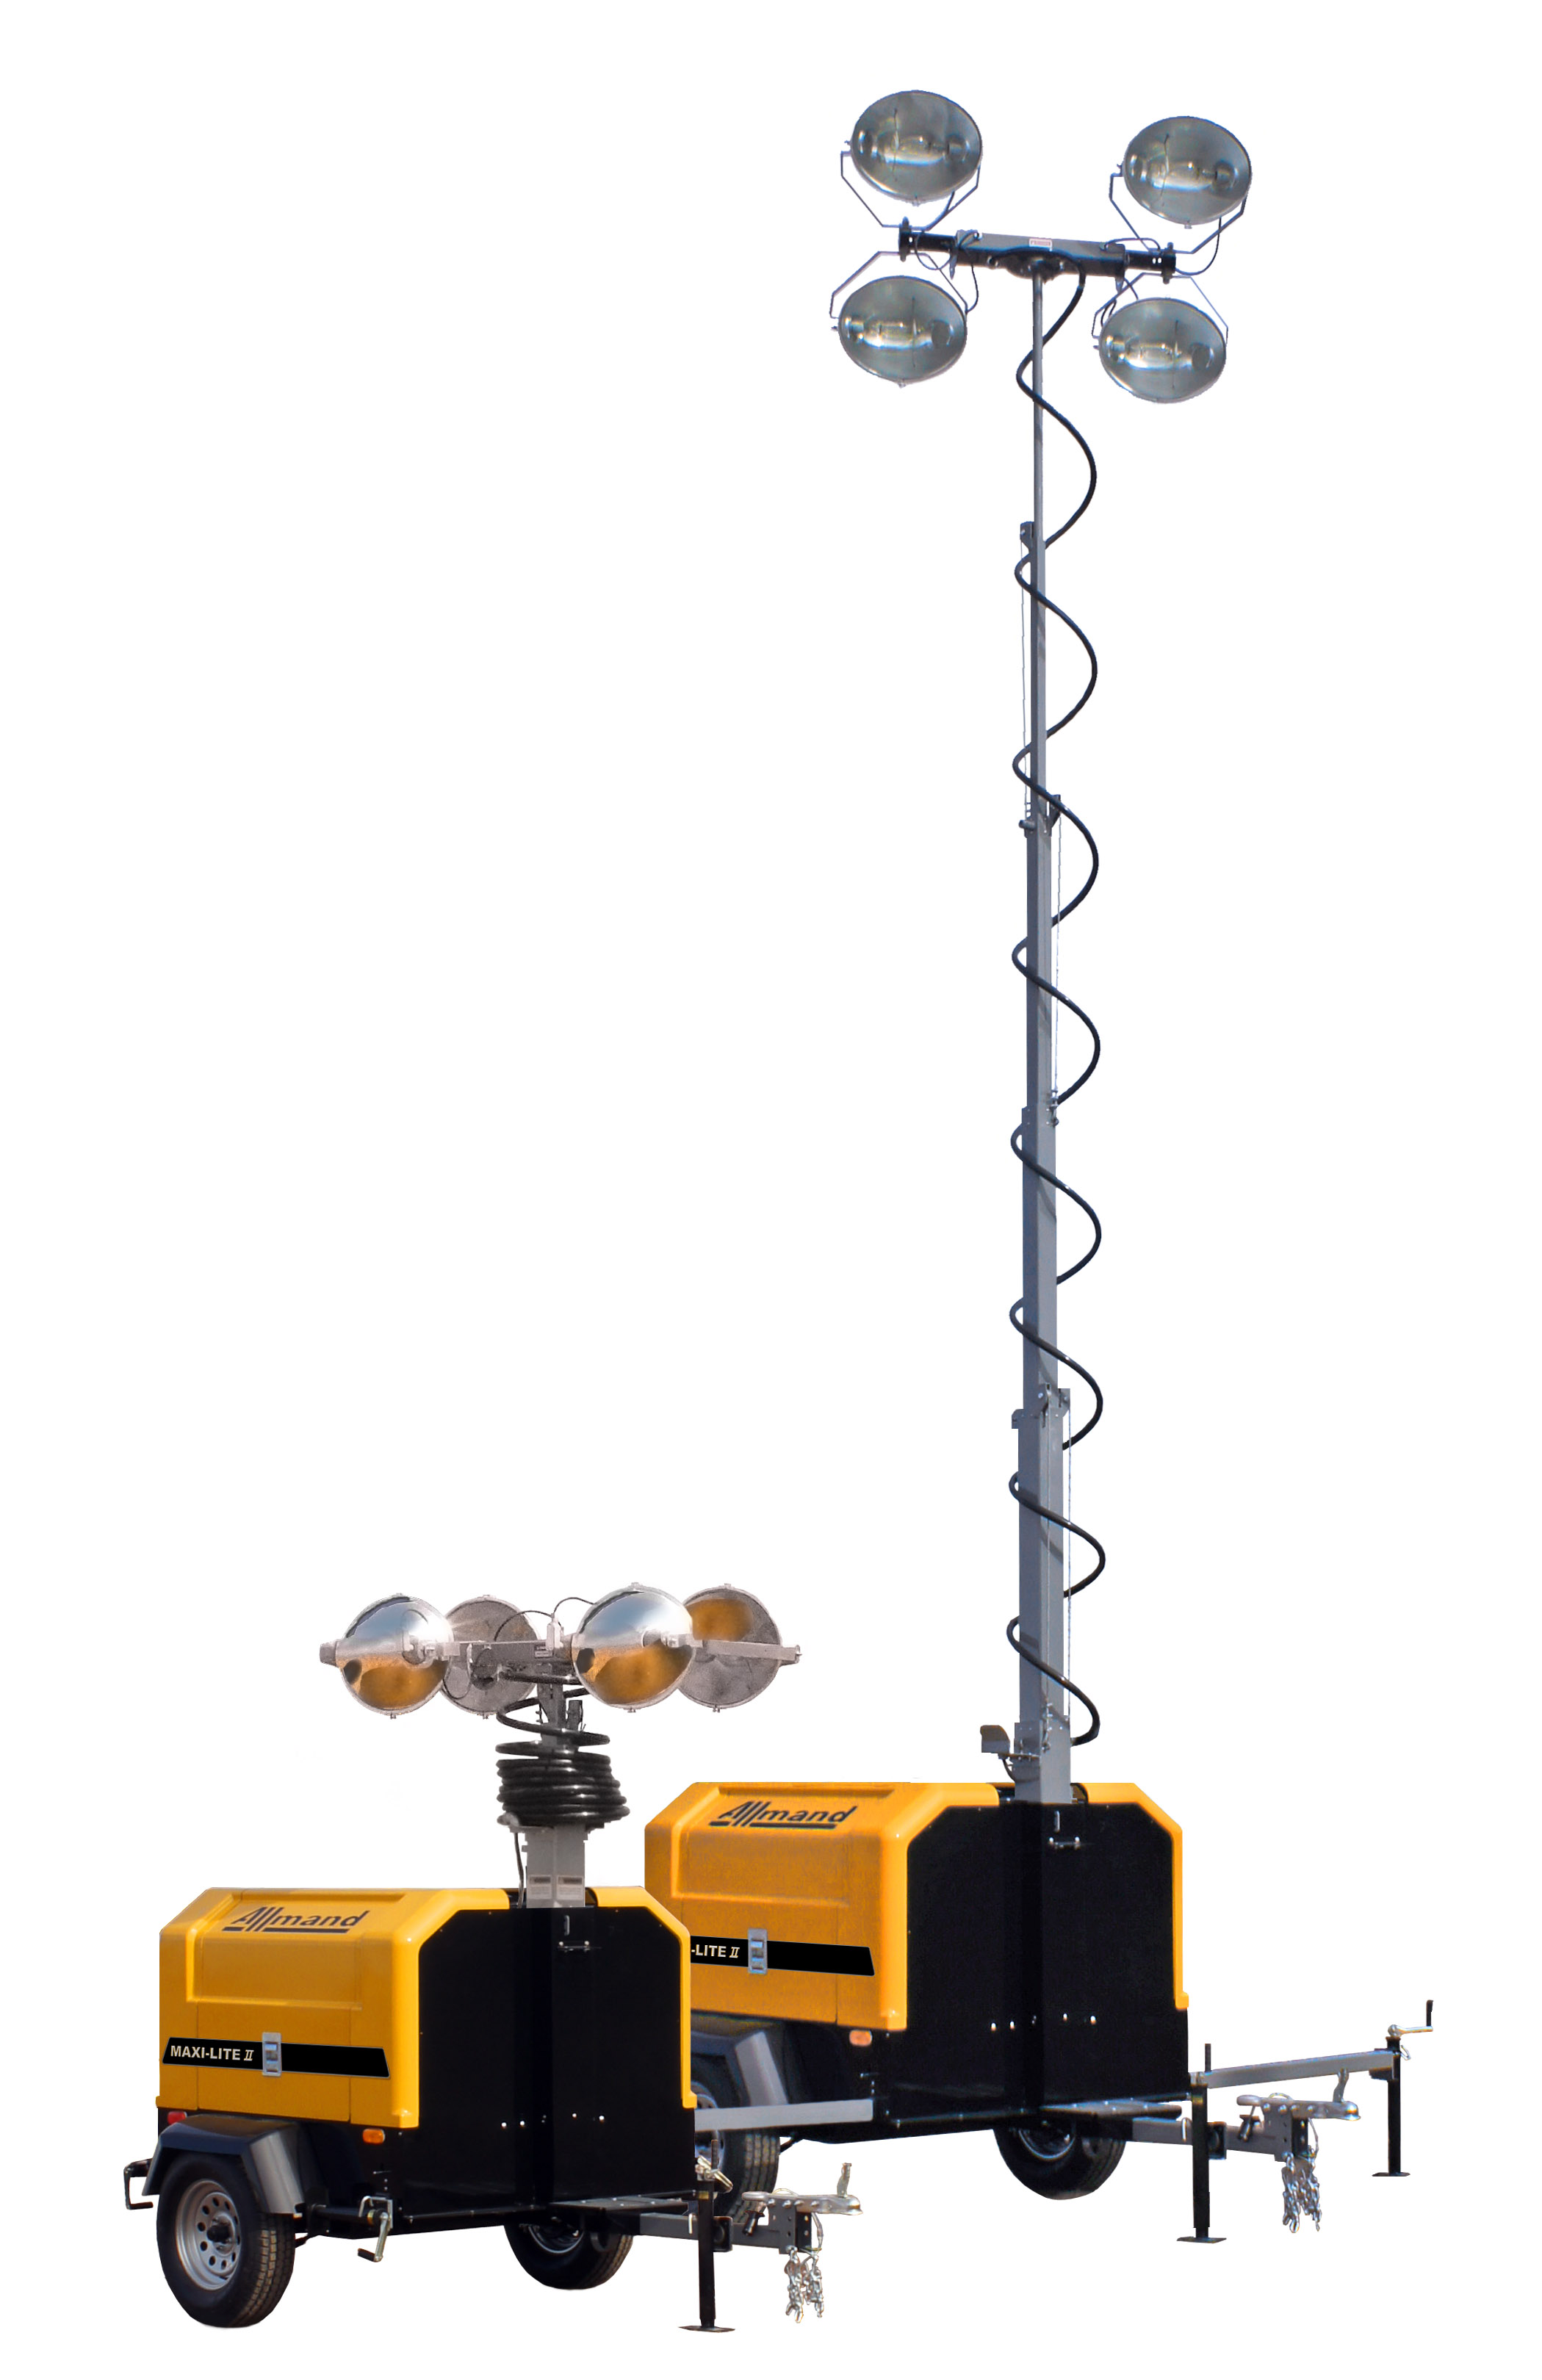 Allmand Unveils New Maxi-Lite II Light Tower - PennEnergy